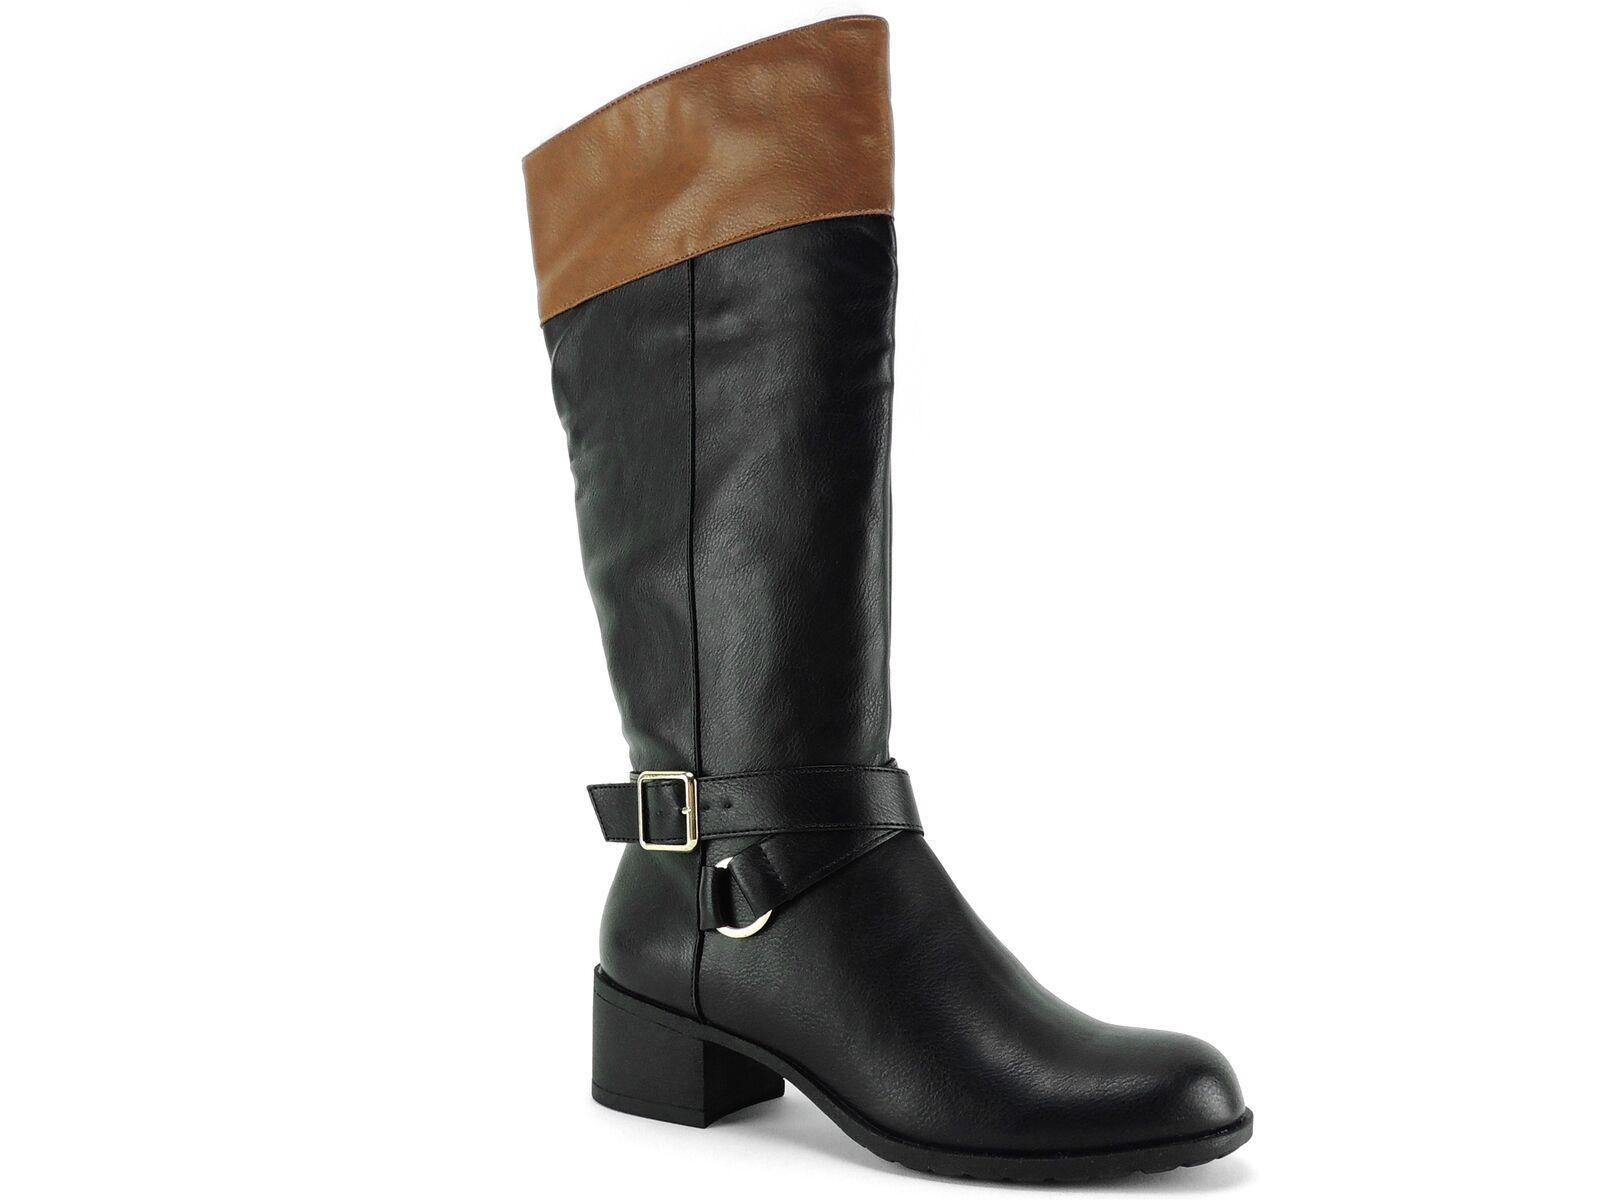 Style&co. Women's Vedaa Boots Black Barrel Size 5 M